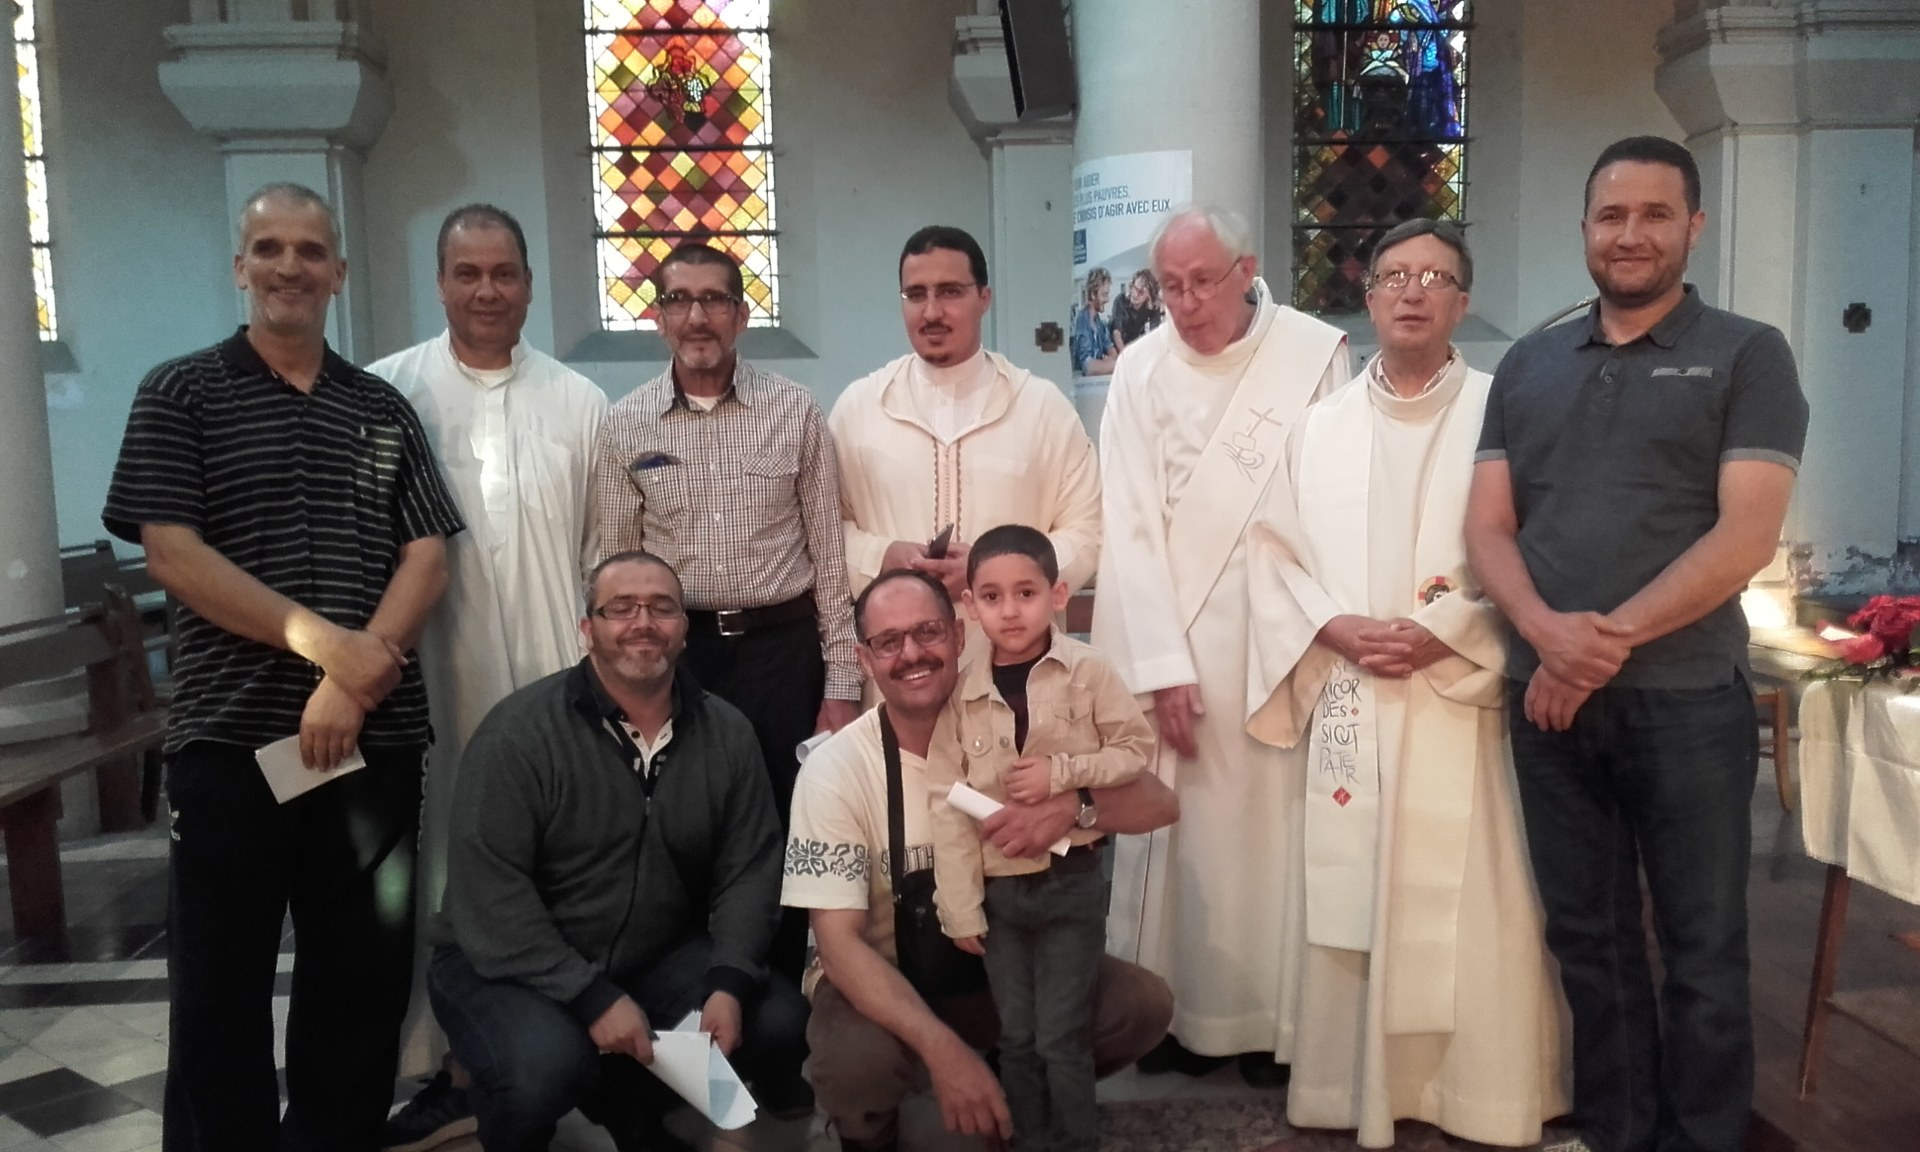 soirée inter-religieuse 29 juillet 2016 2